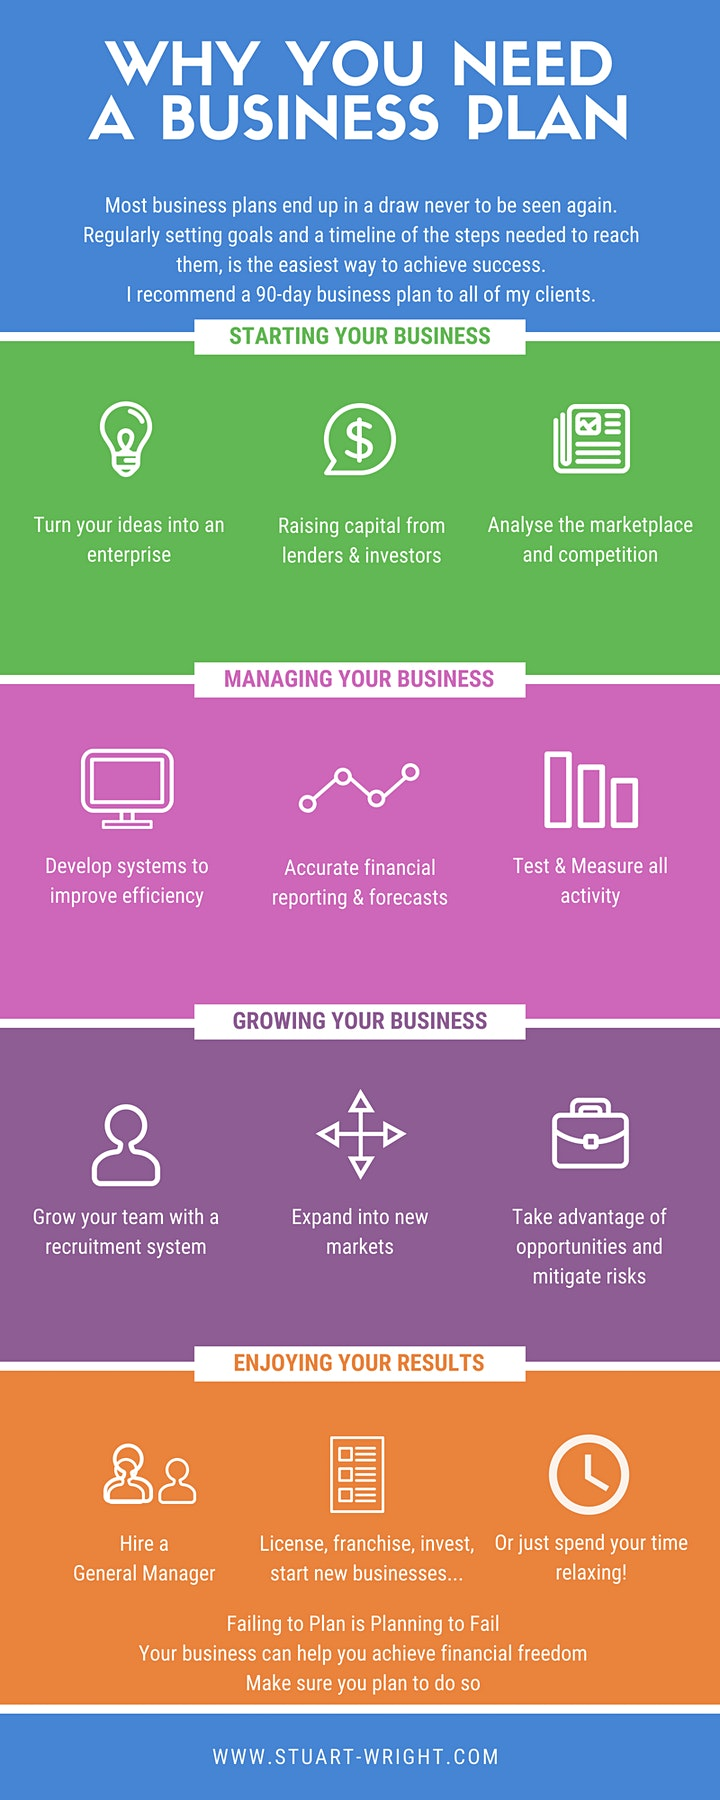 90 Day Business Planning Workshop image